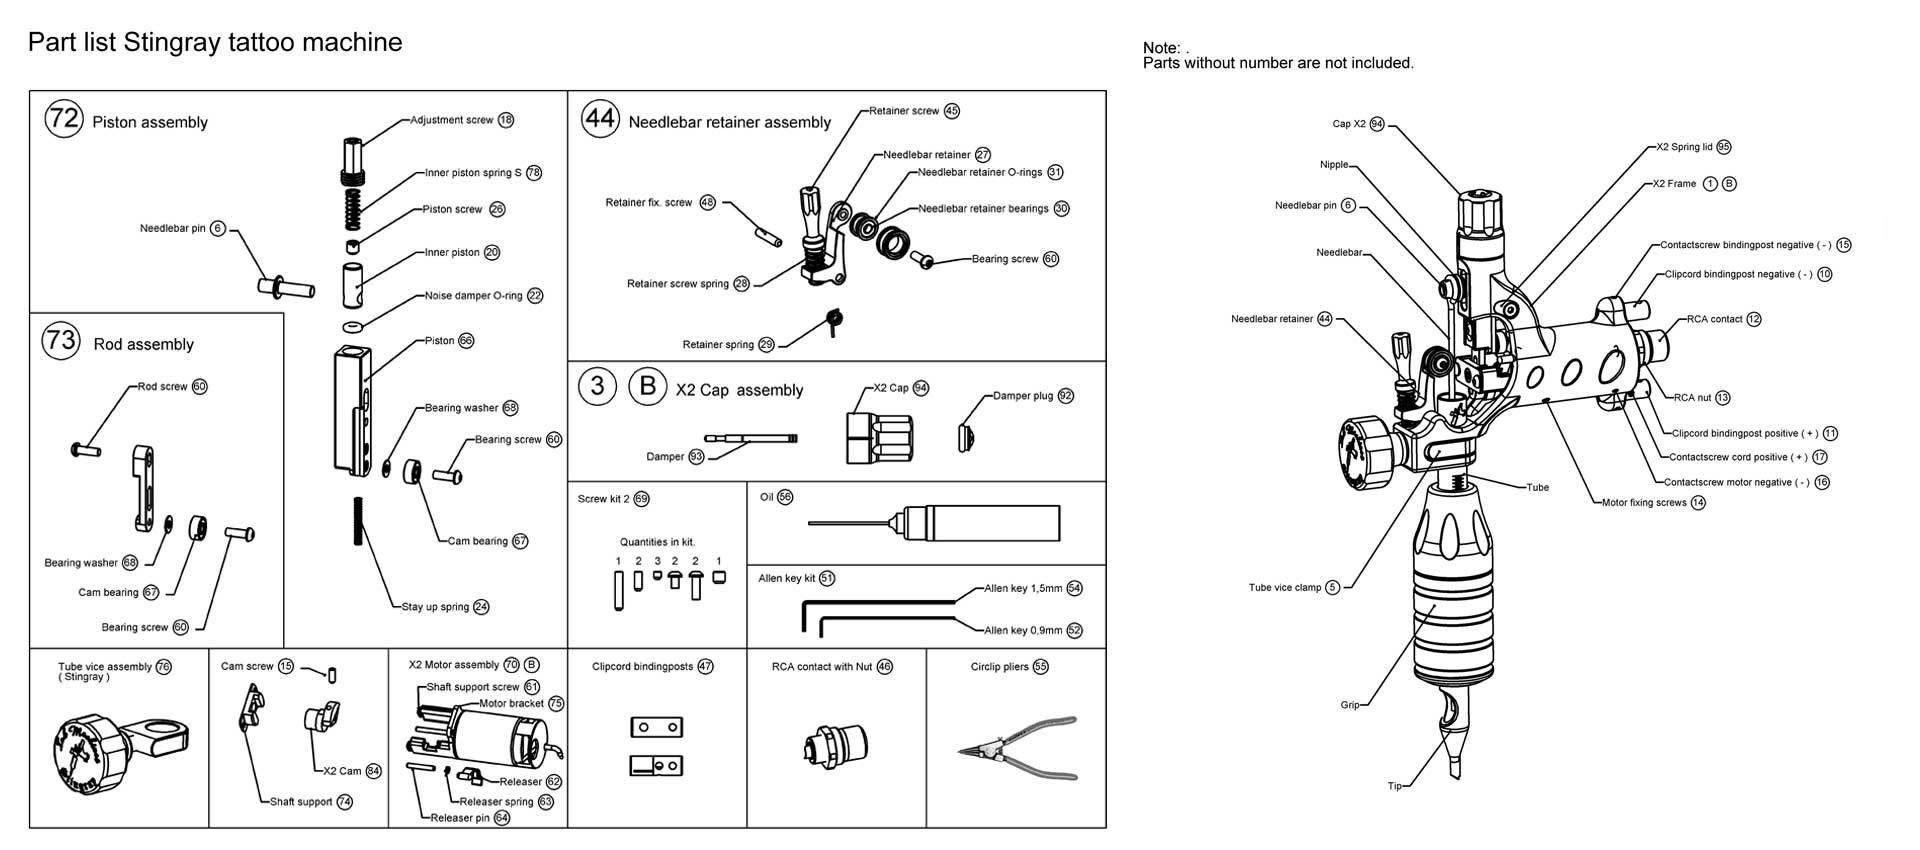 Stingray Motor Assembly Nordic Tattoo Supplies Cheyenne Rotary Machine Diagram